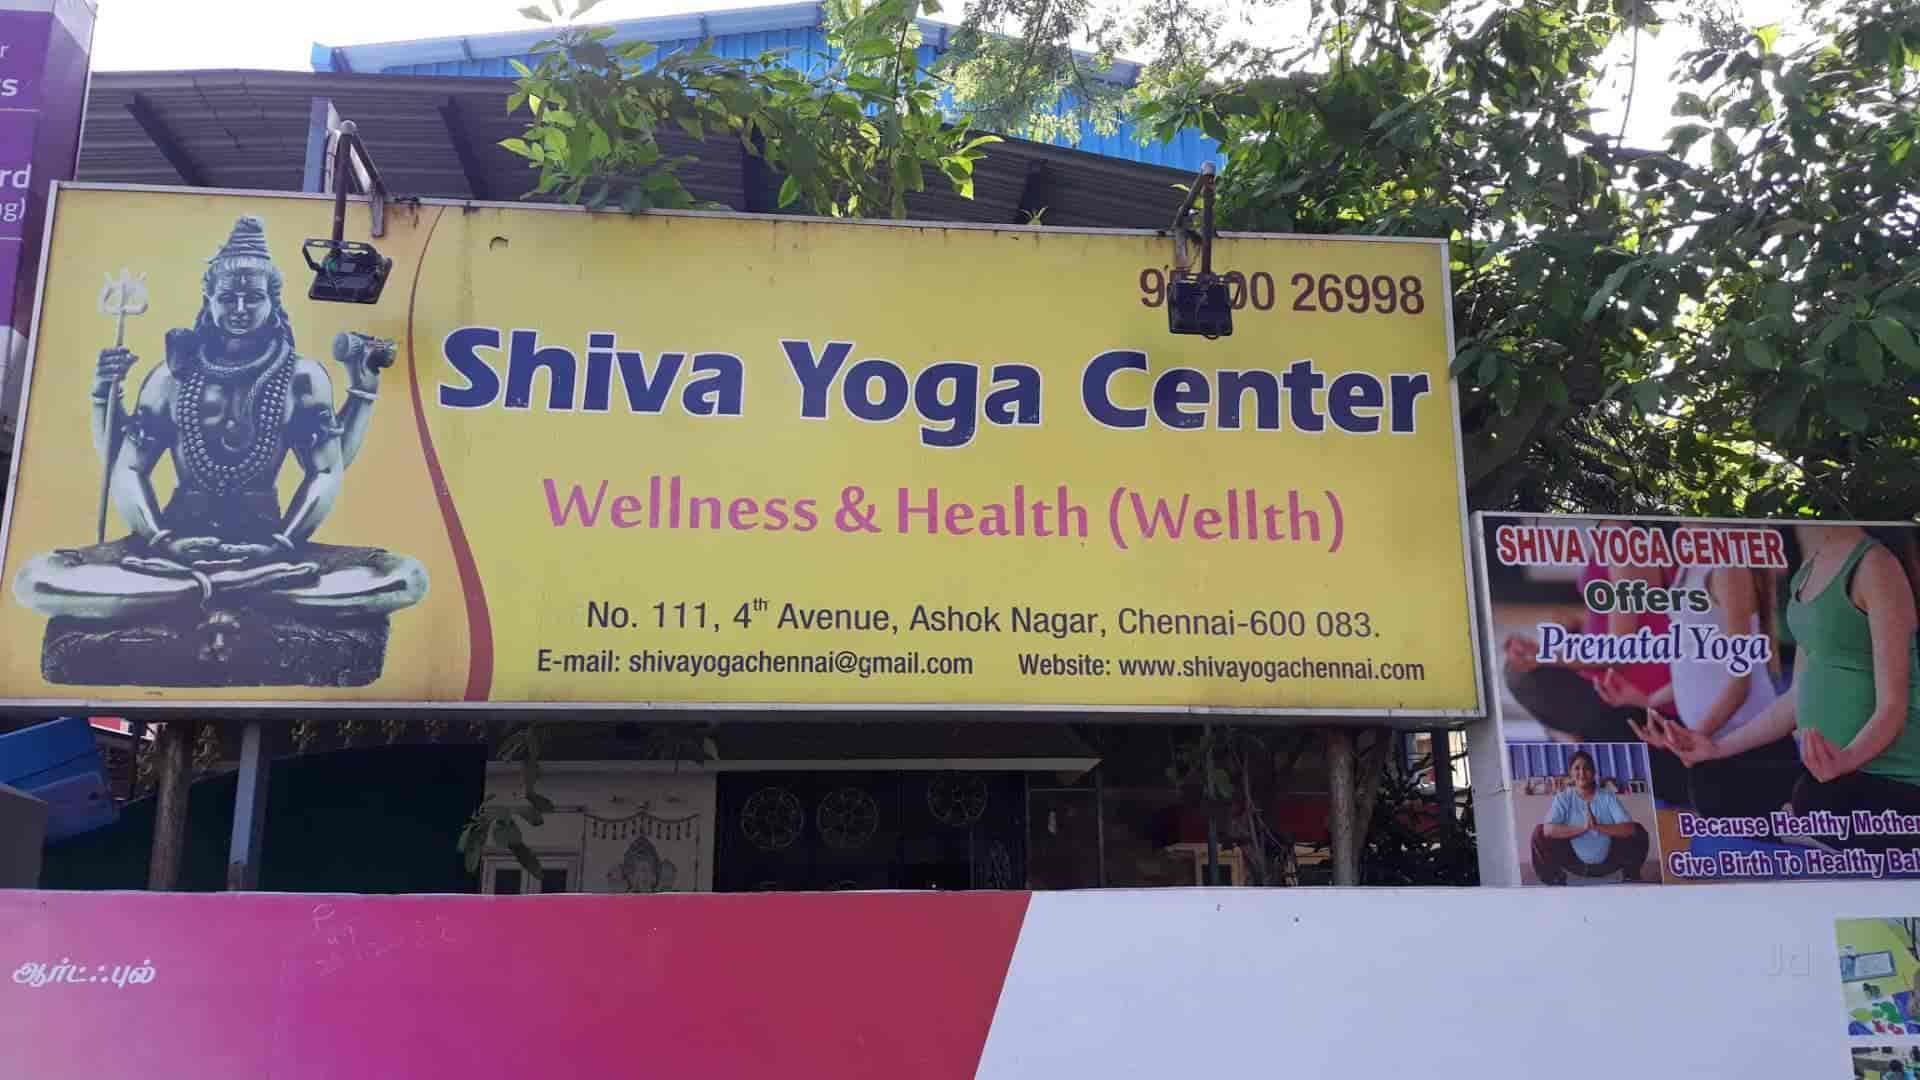 Shiva Yoga Centre Ashok Nagar Mindfulness Meditation Classes In Chennai Justdial